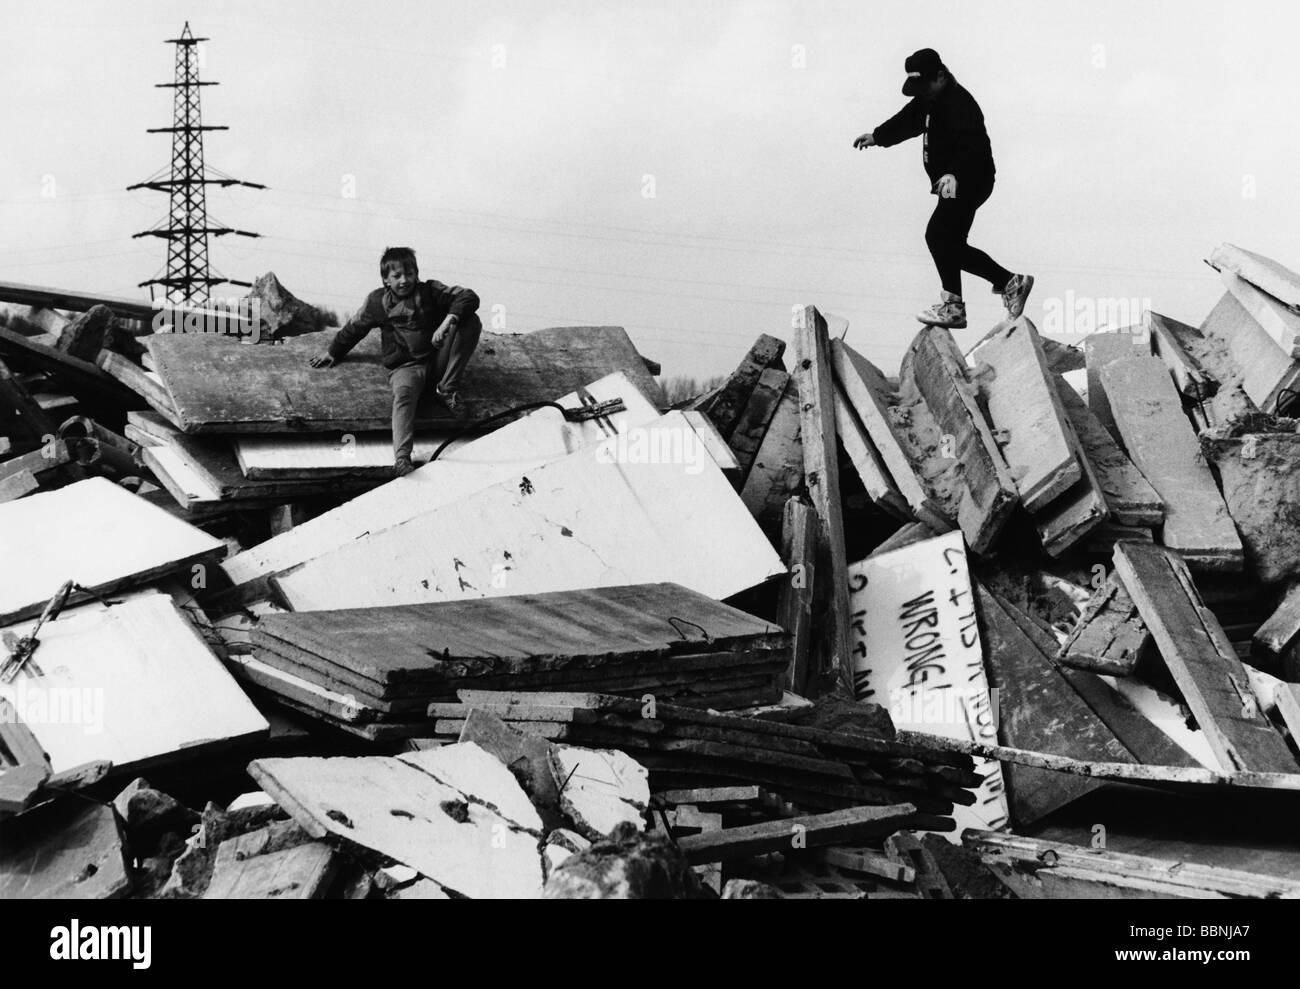 geography / travel, Germany, Berlin, wall, destruction, Schoenwalde/Spandau, children plying on the rubble, 4.4.1992, - Stock Image